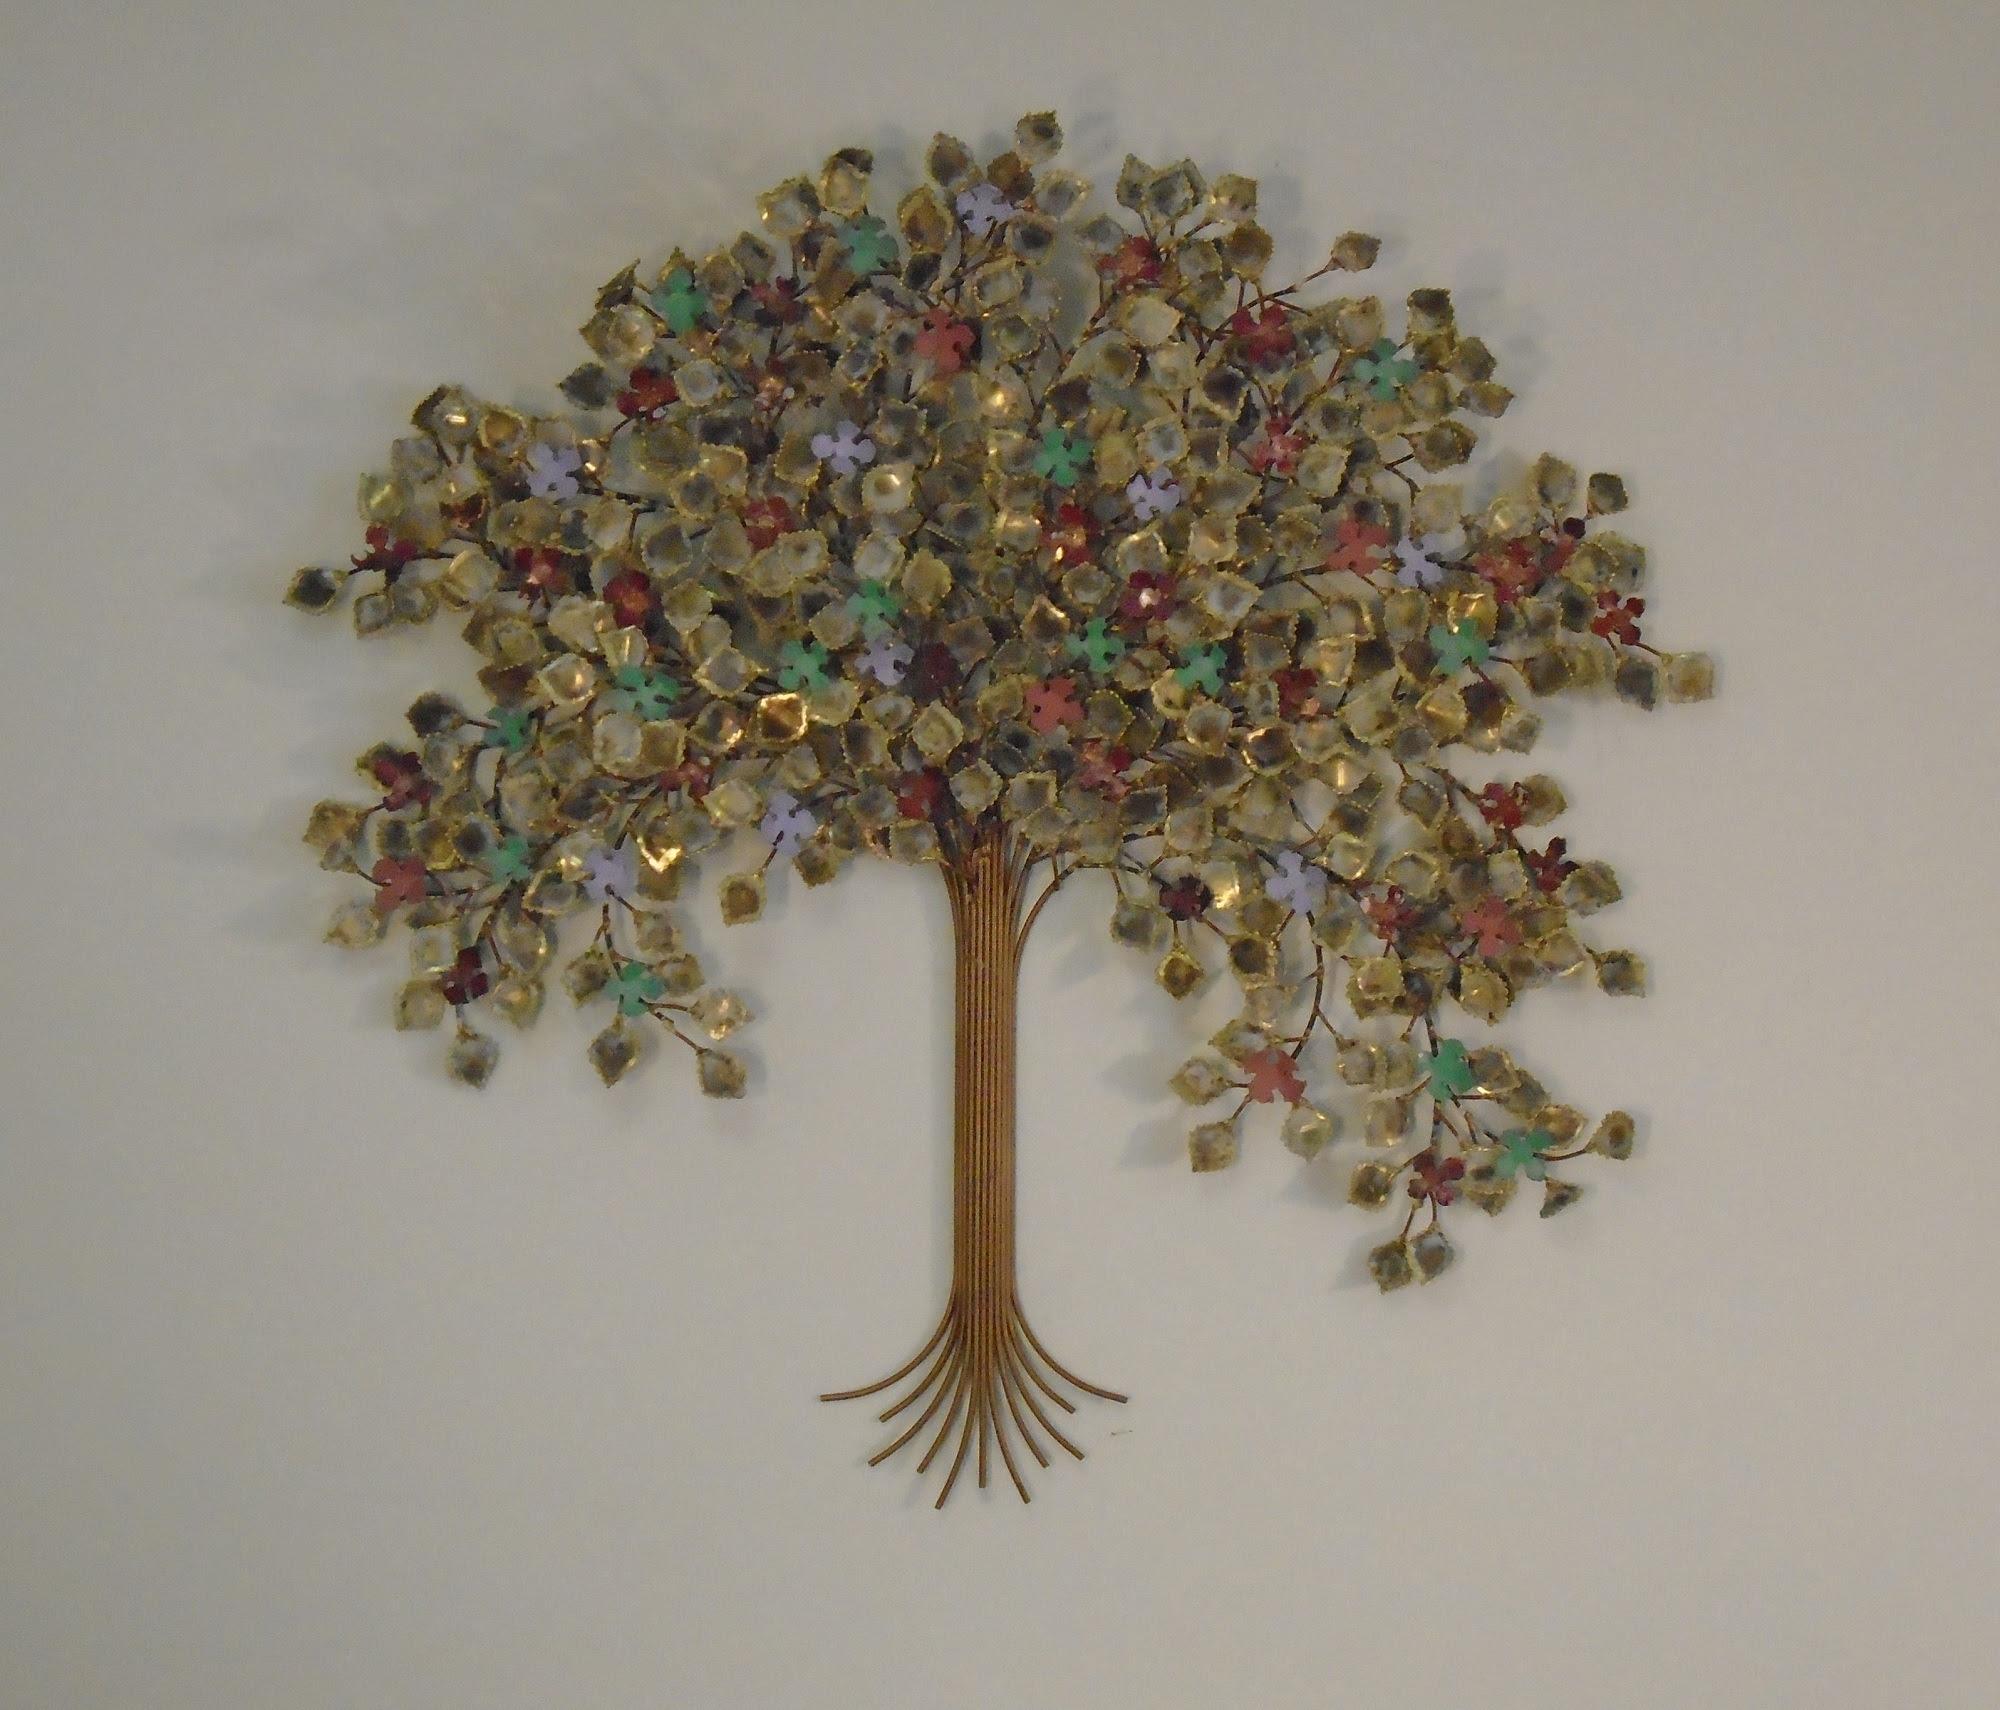 Metal Wall Art and Wall Decor - Trees - Gurtan Designs